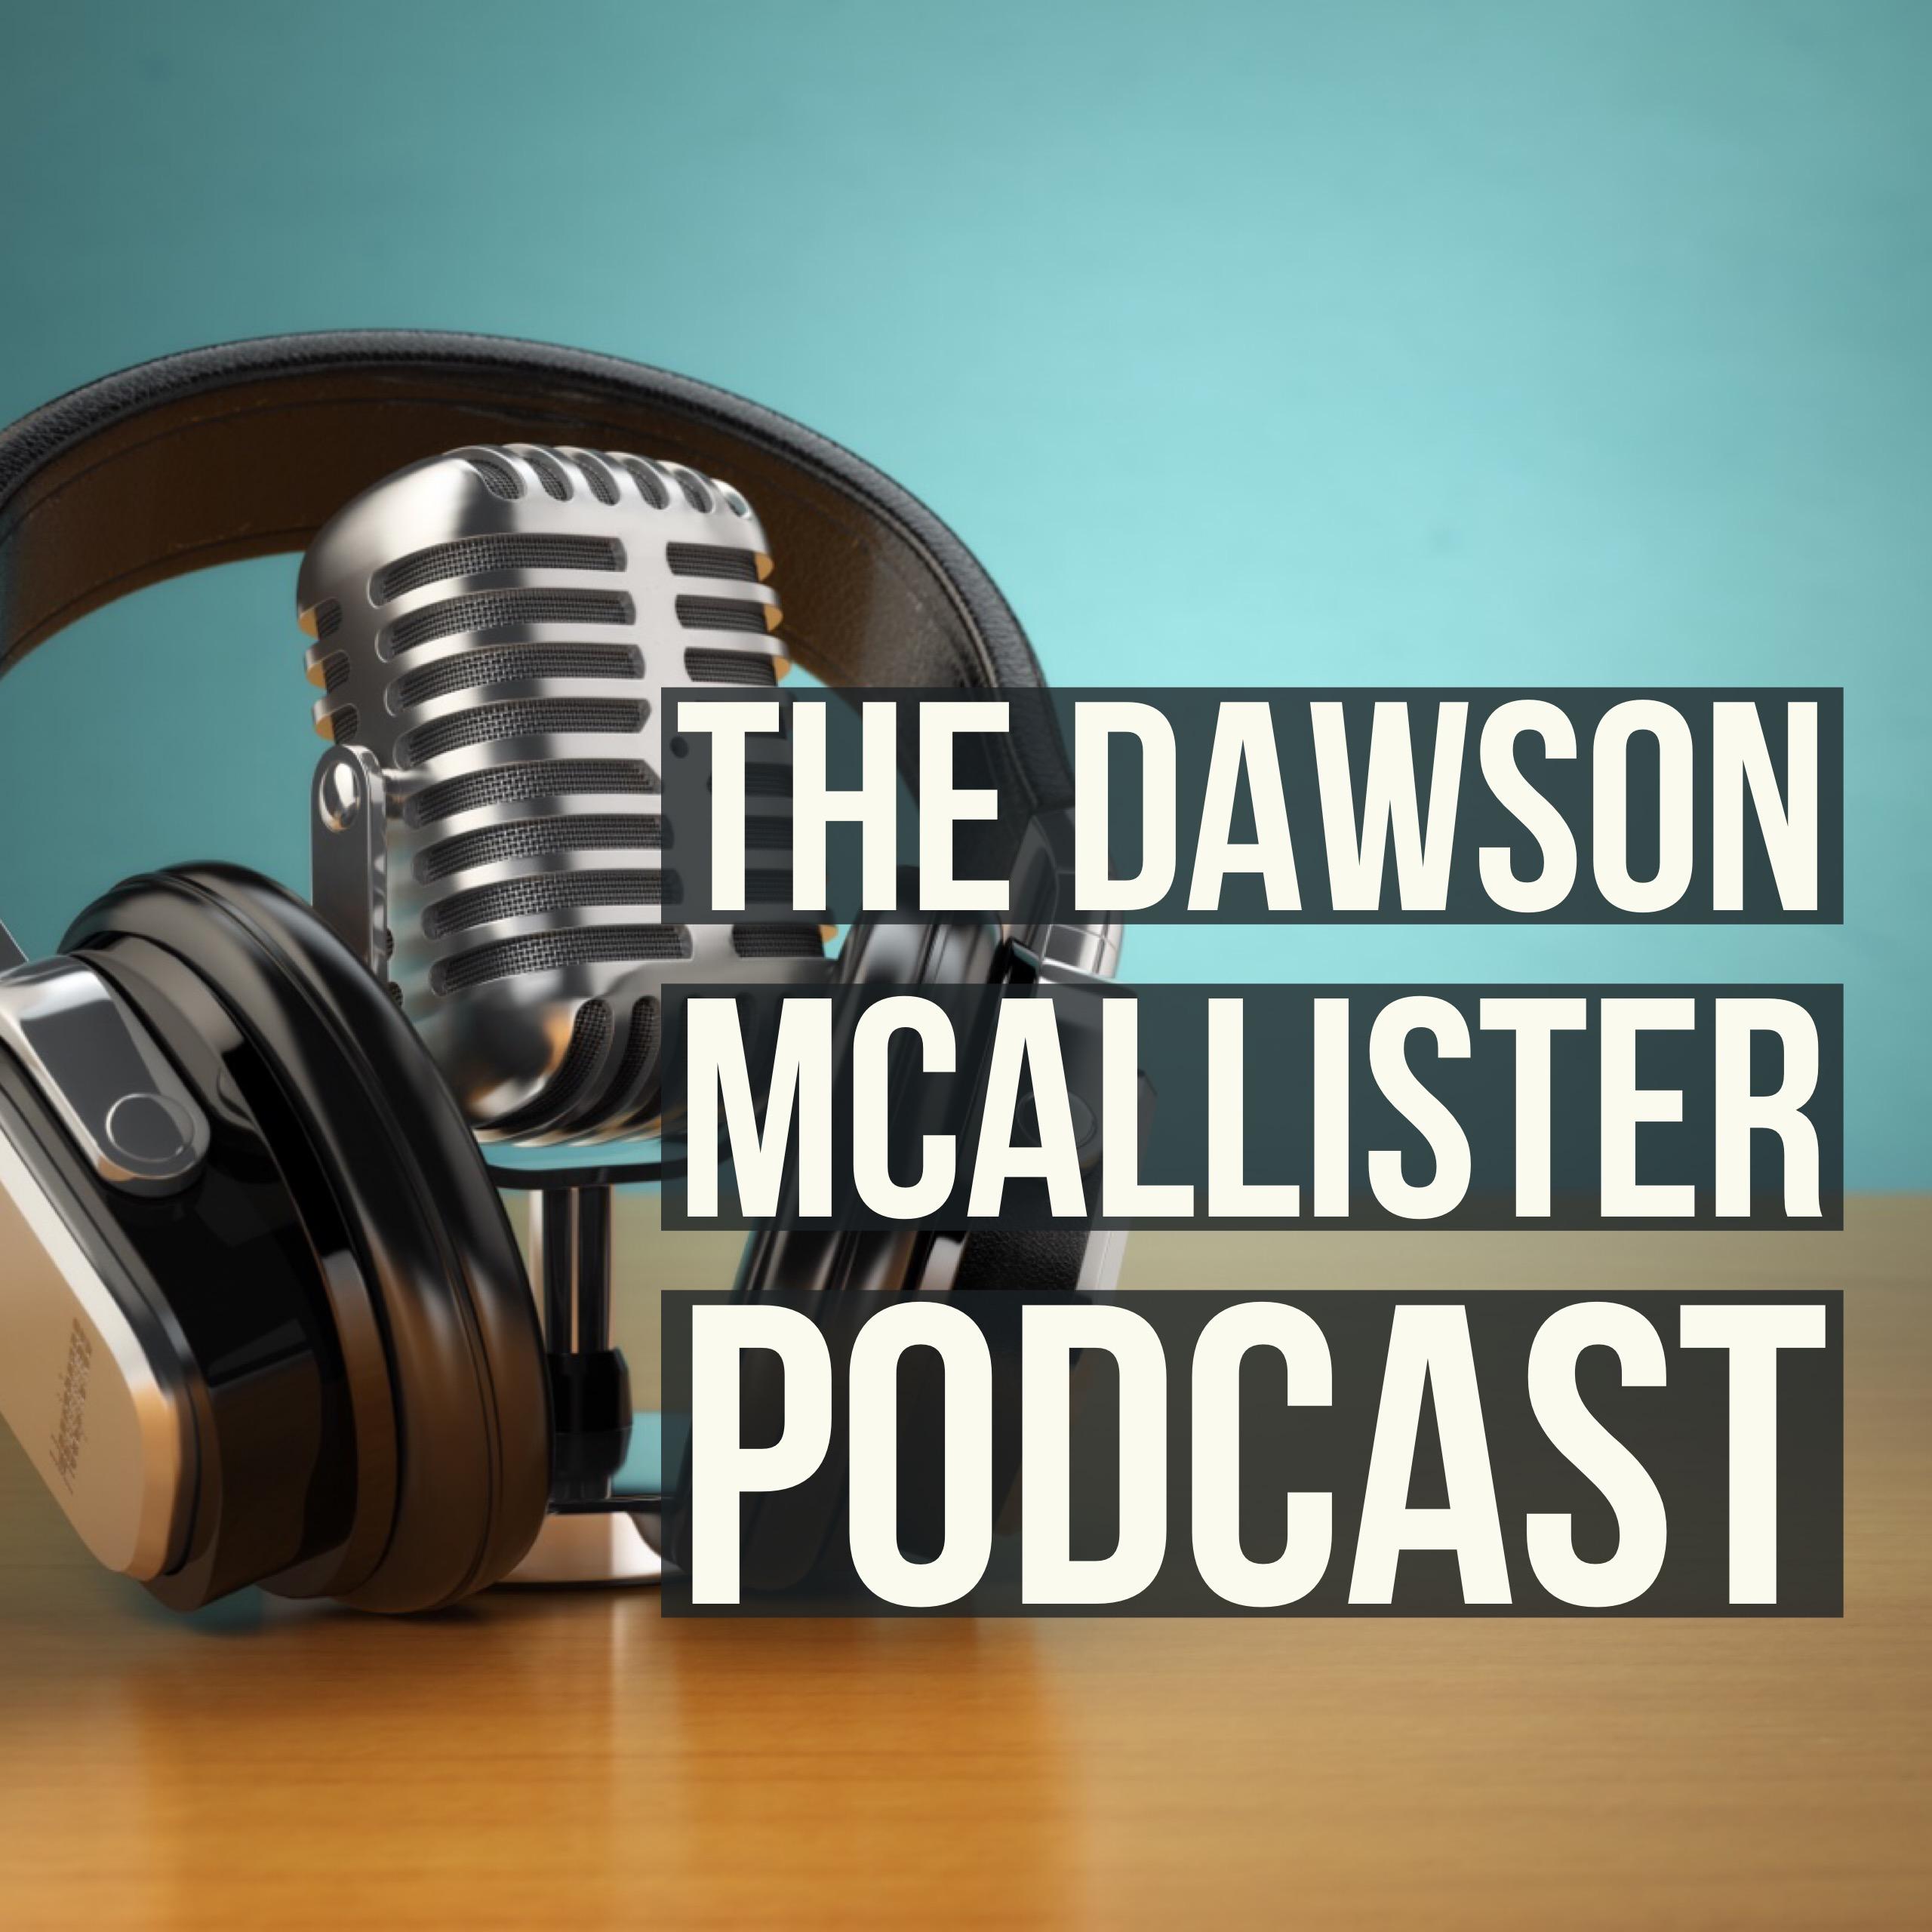 The Dawson McAllister Podcast show art